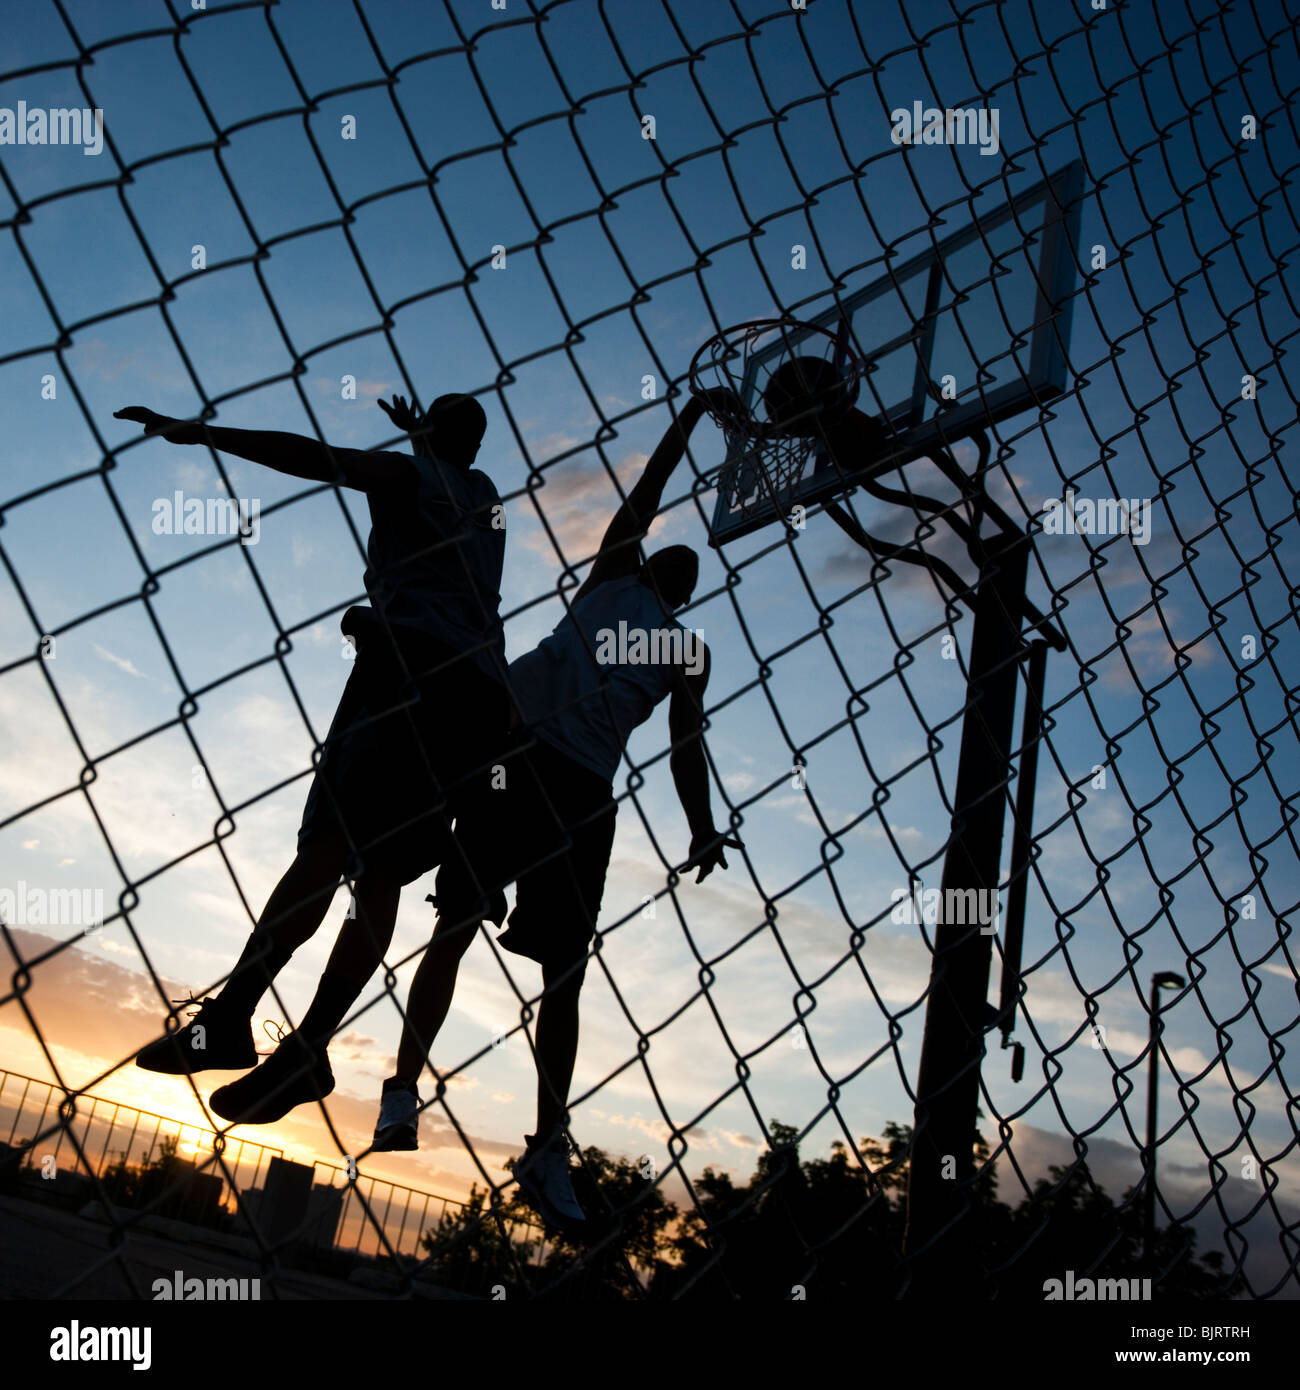 USA, Utah, Salt Lake City, zwei junge Männer spielen street-Basketball, niedrigen Winkel Ansicht Stockbild